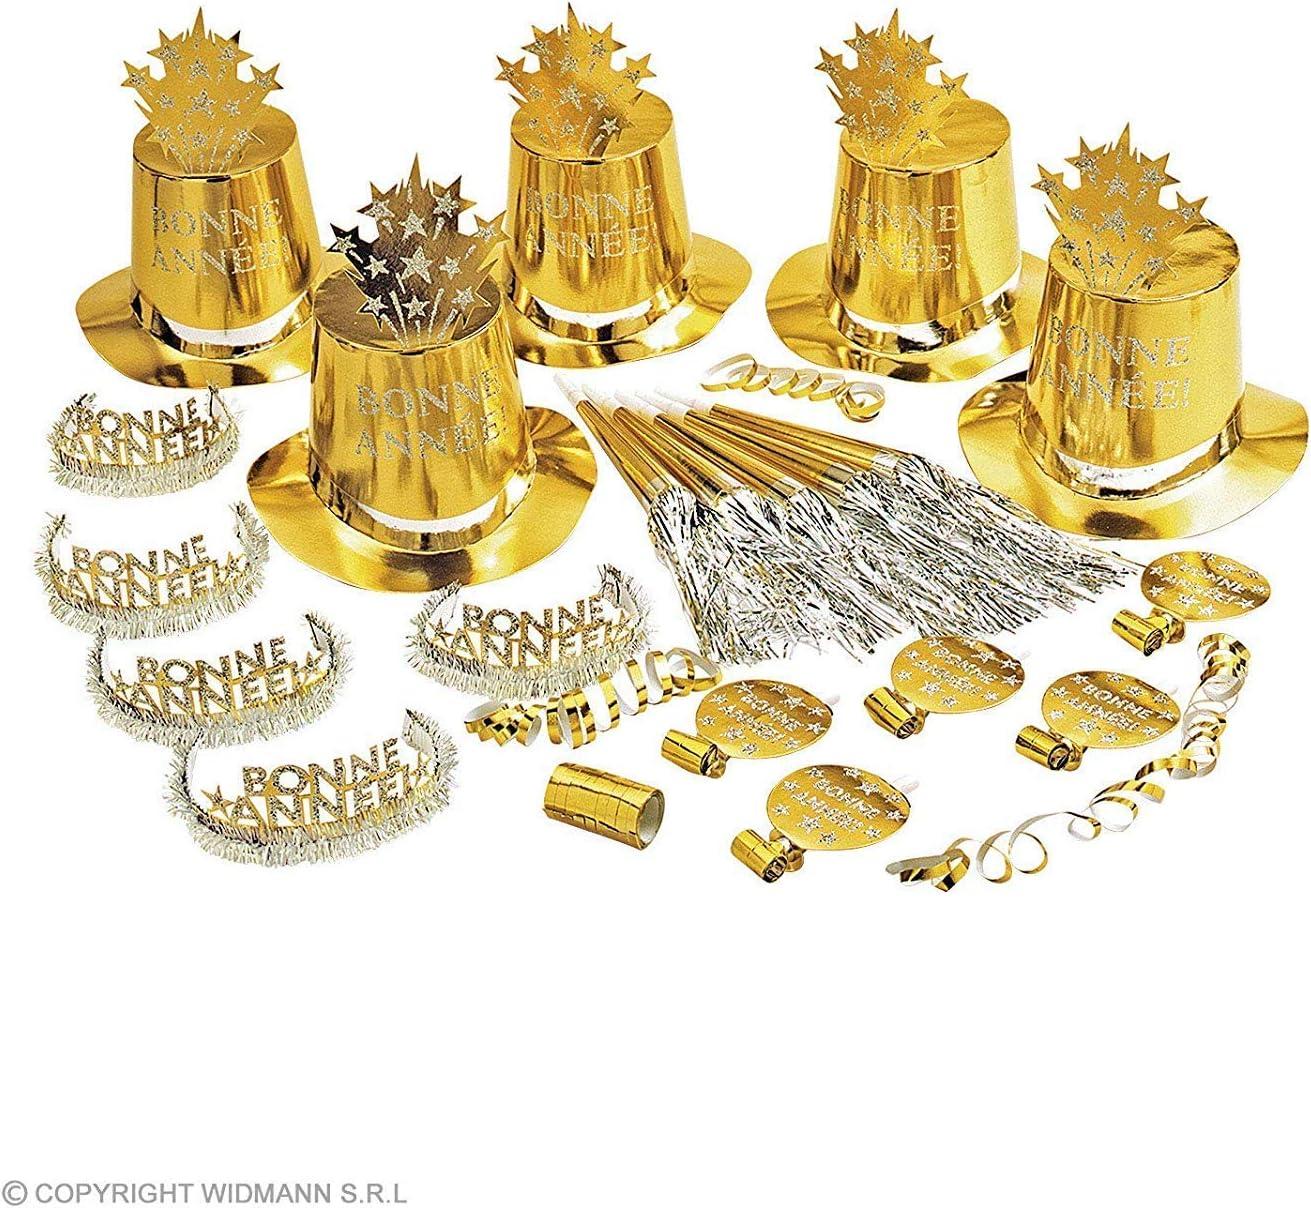 WIDMANN Kit de cotillón dorado